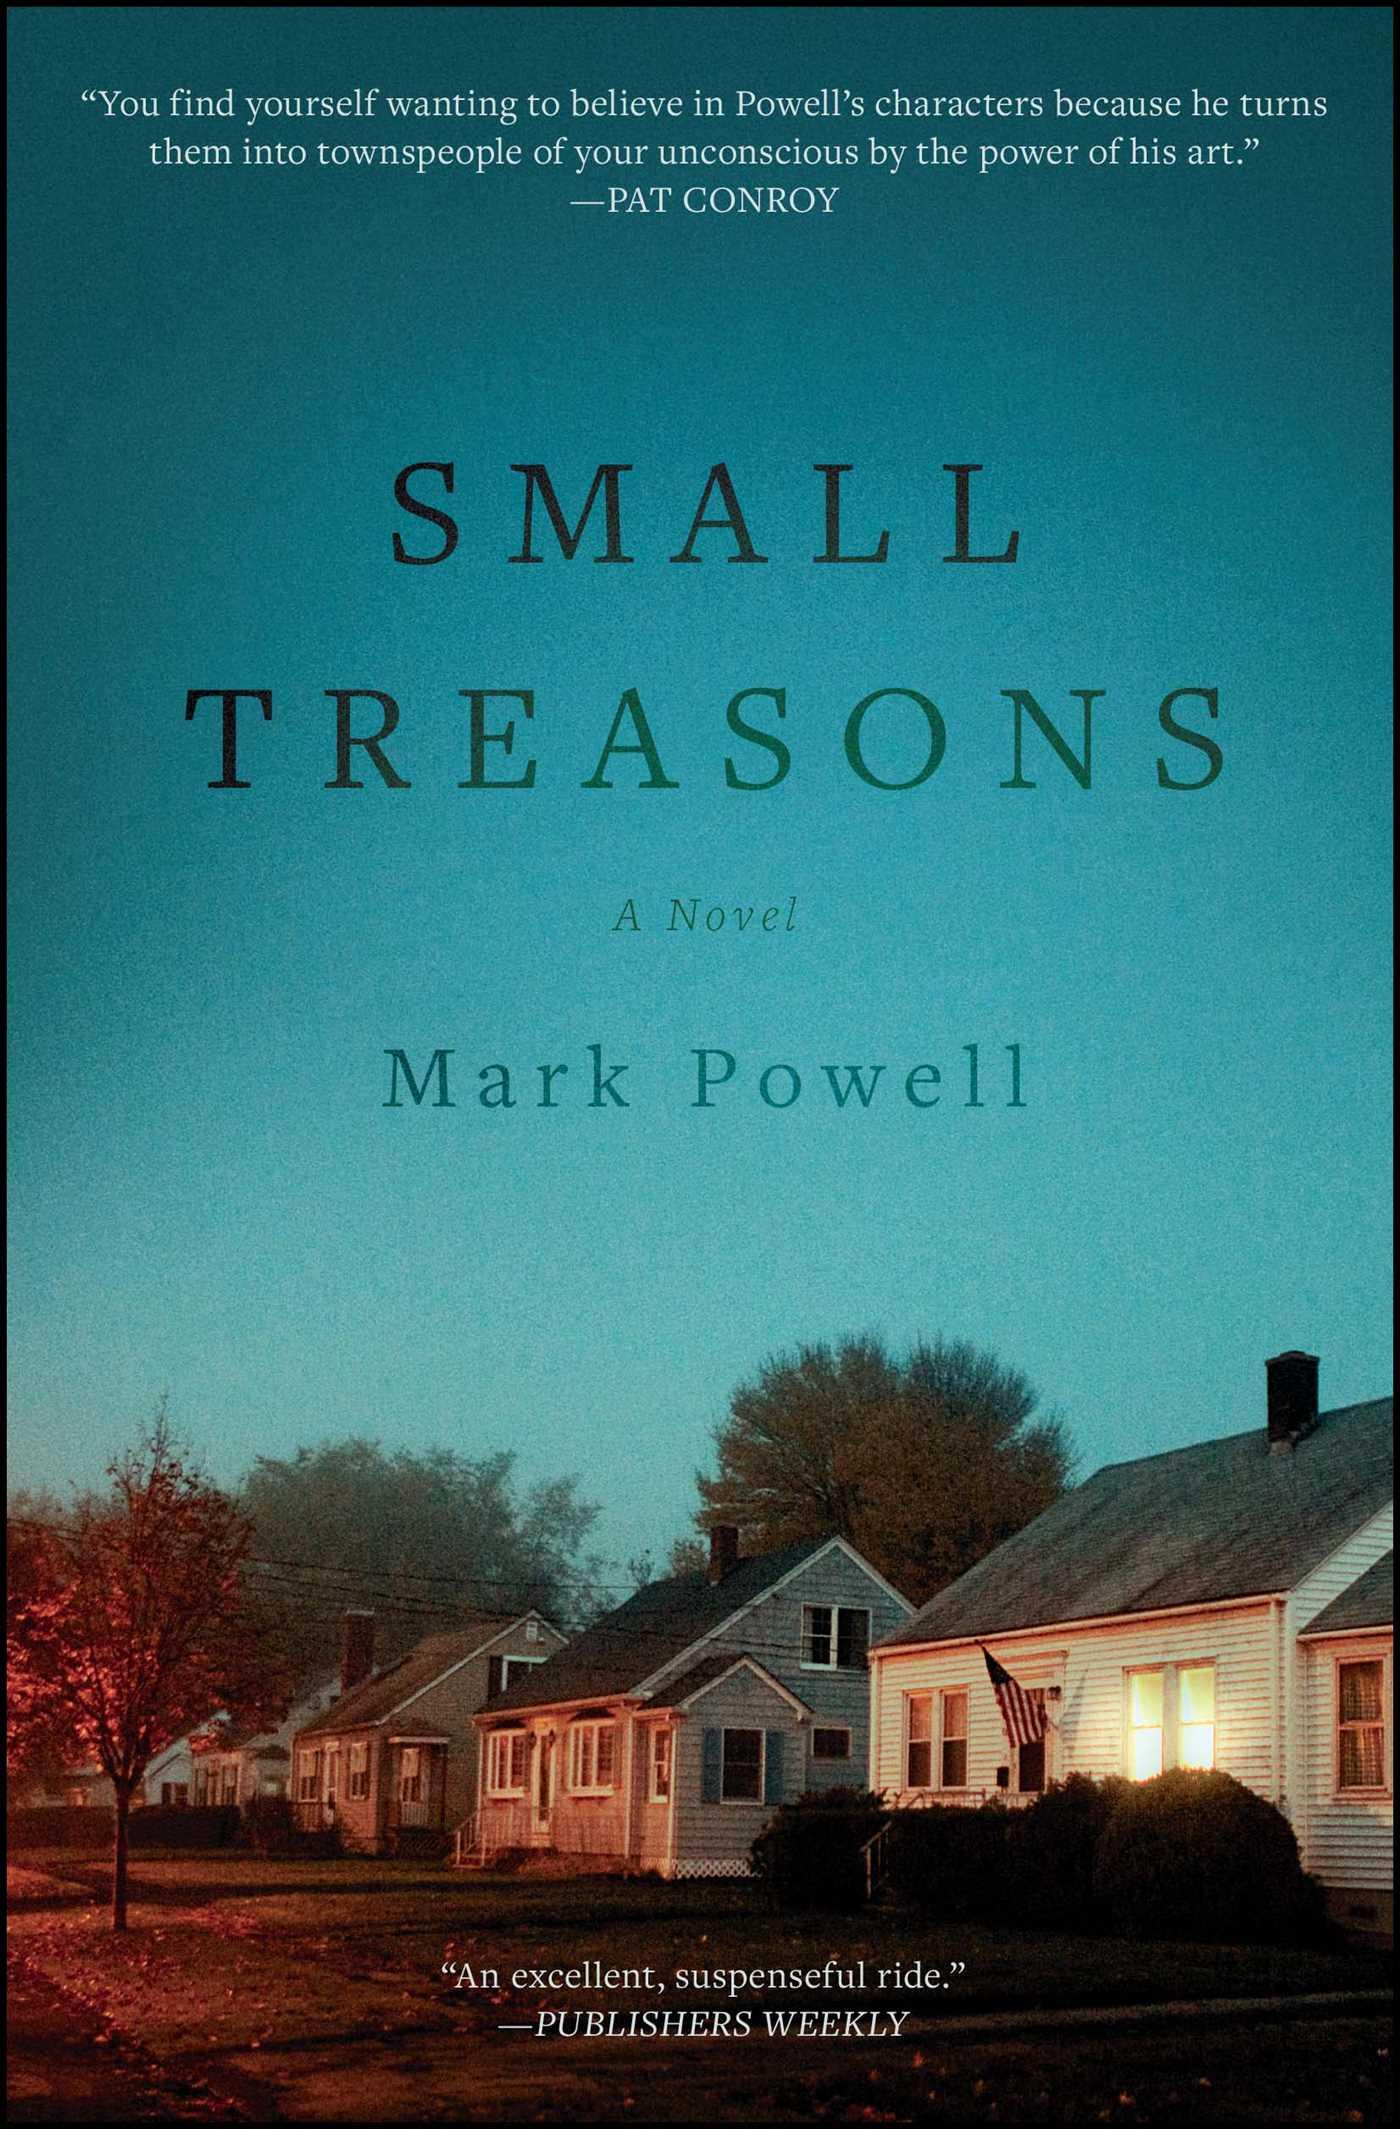 Small treasons 9781507203378 hr